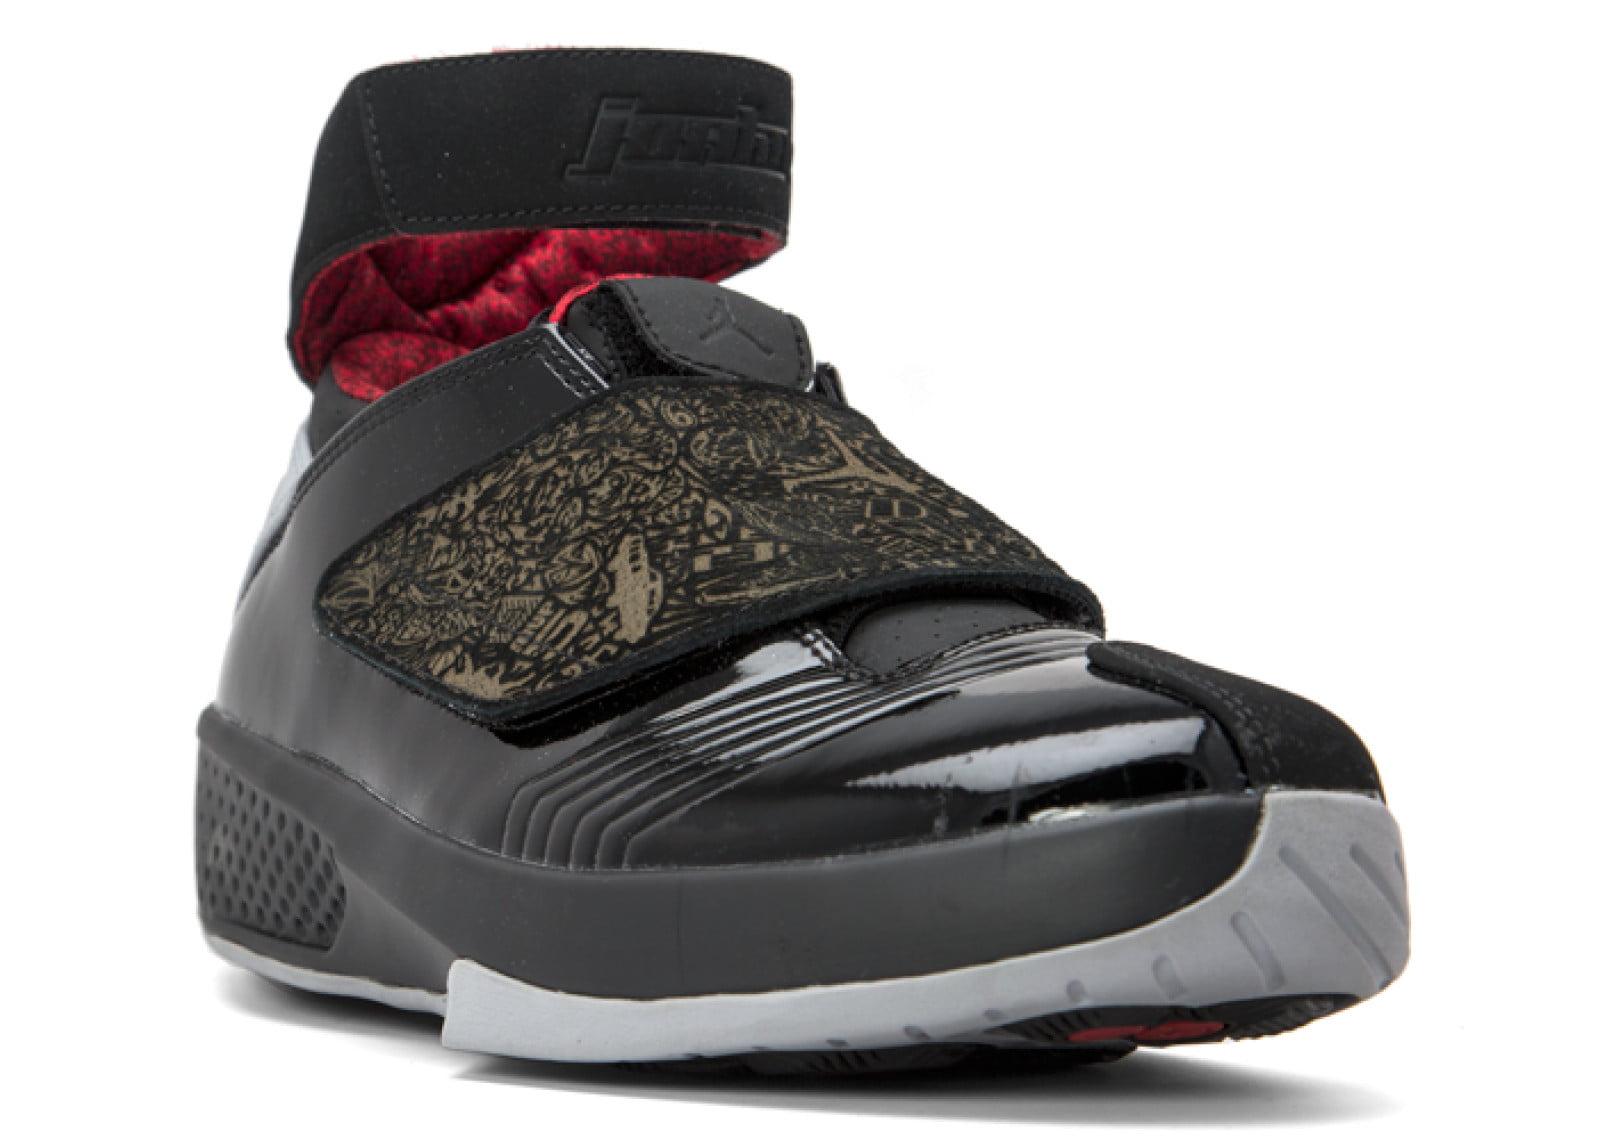 8d0bd5a2115149 Air Jordan - Men - Air Jordan 20  Stealth 2015  - 310455-002 - Size 10.5